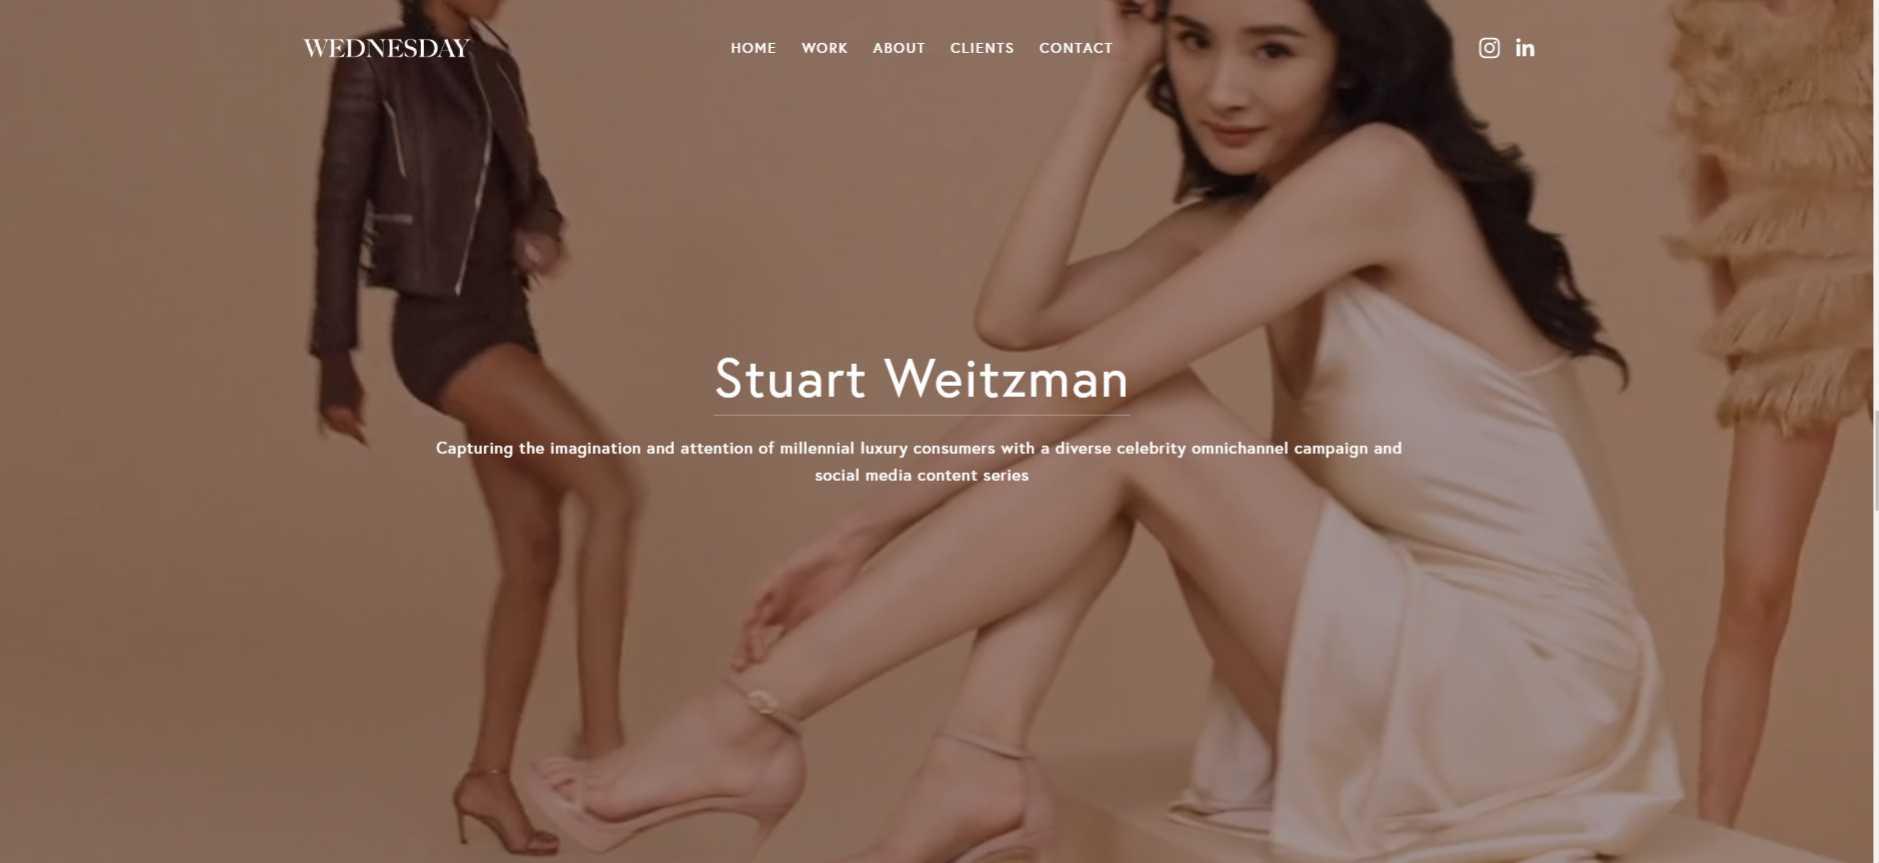 Wednesday agency website